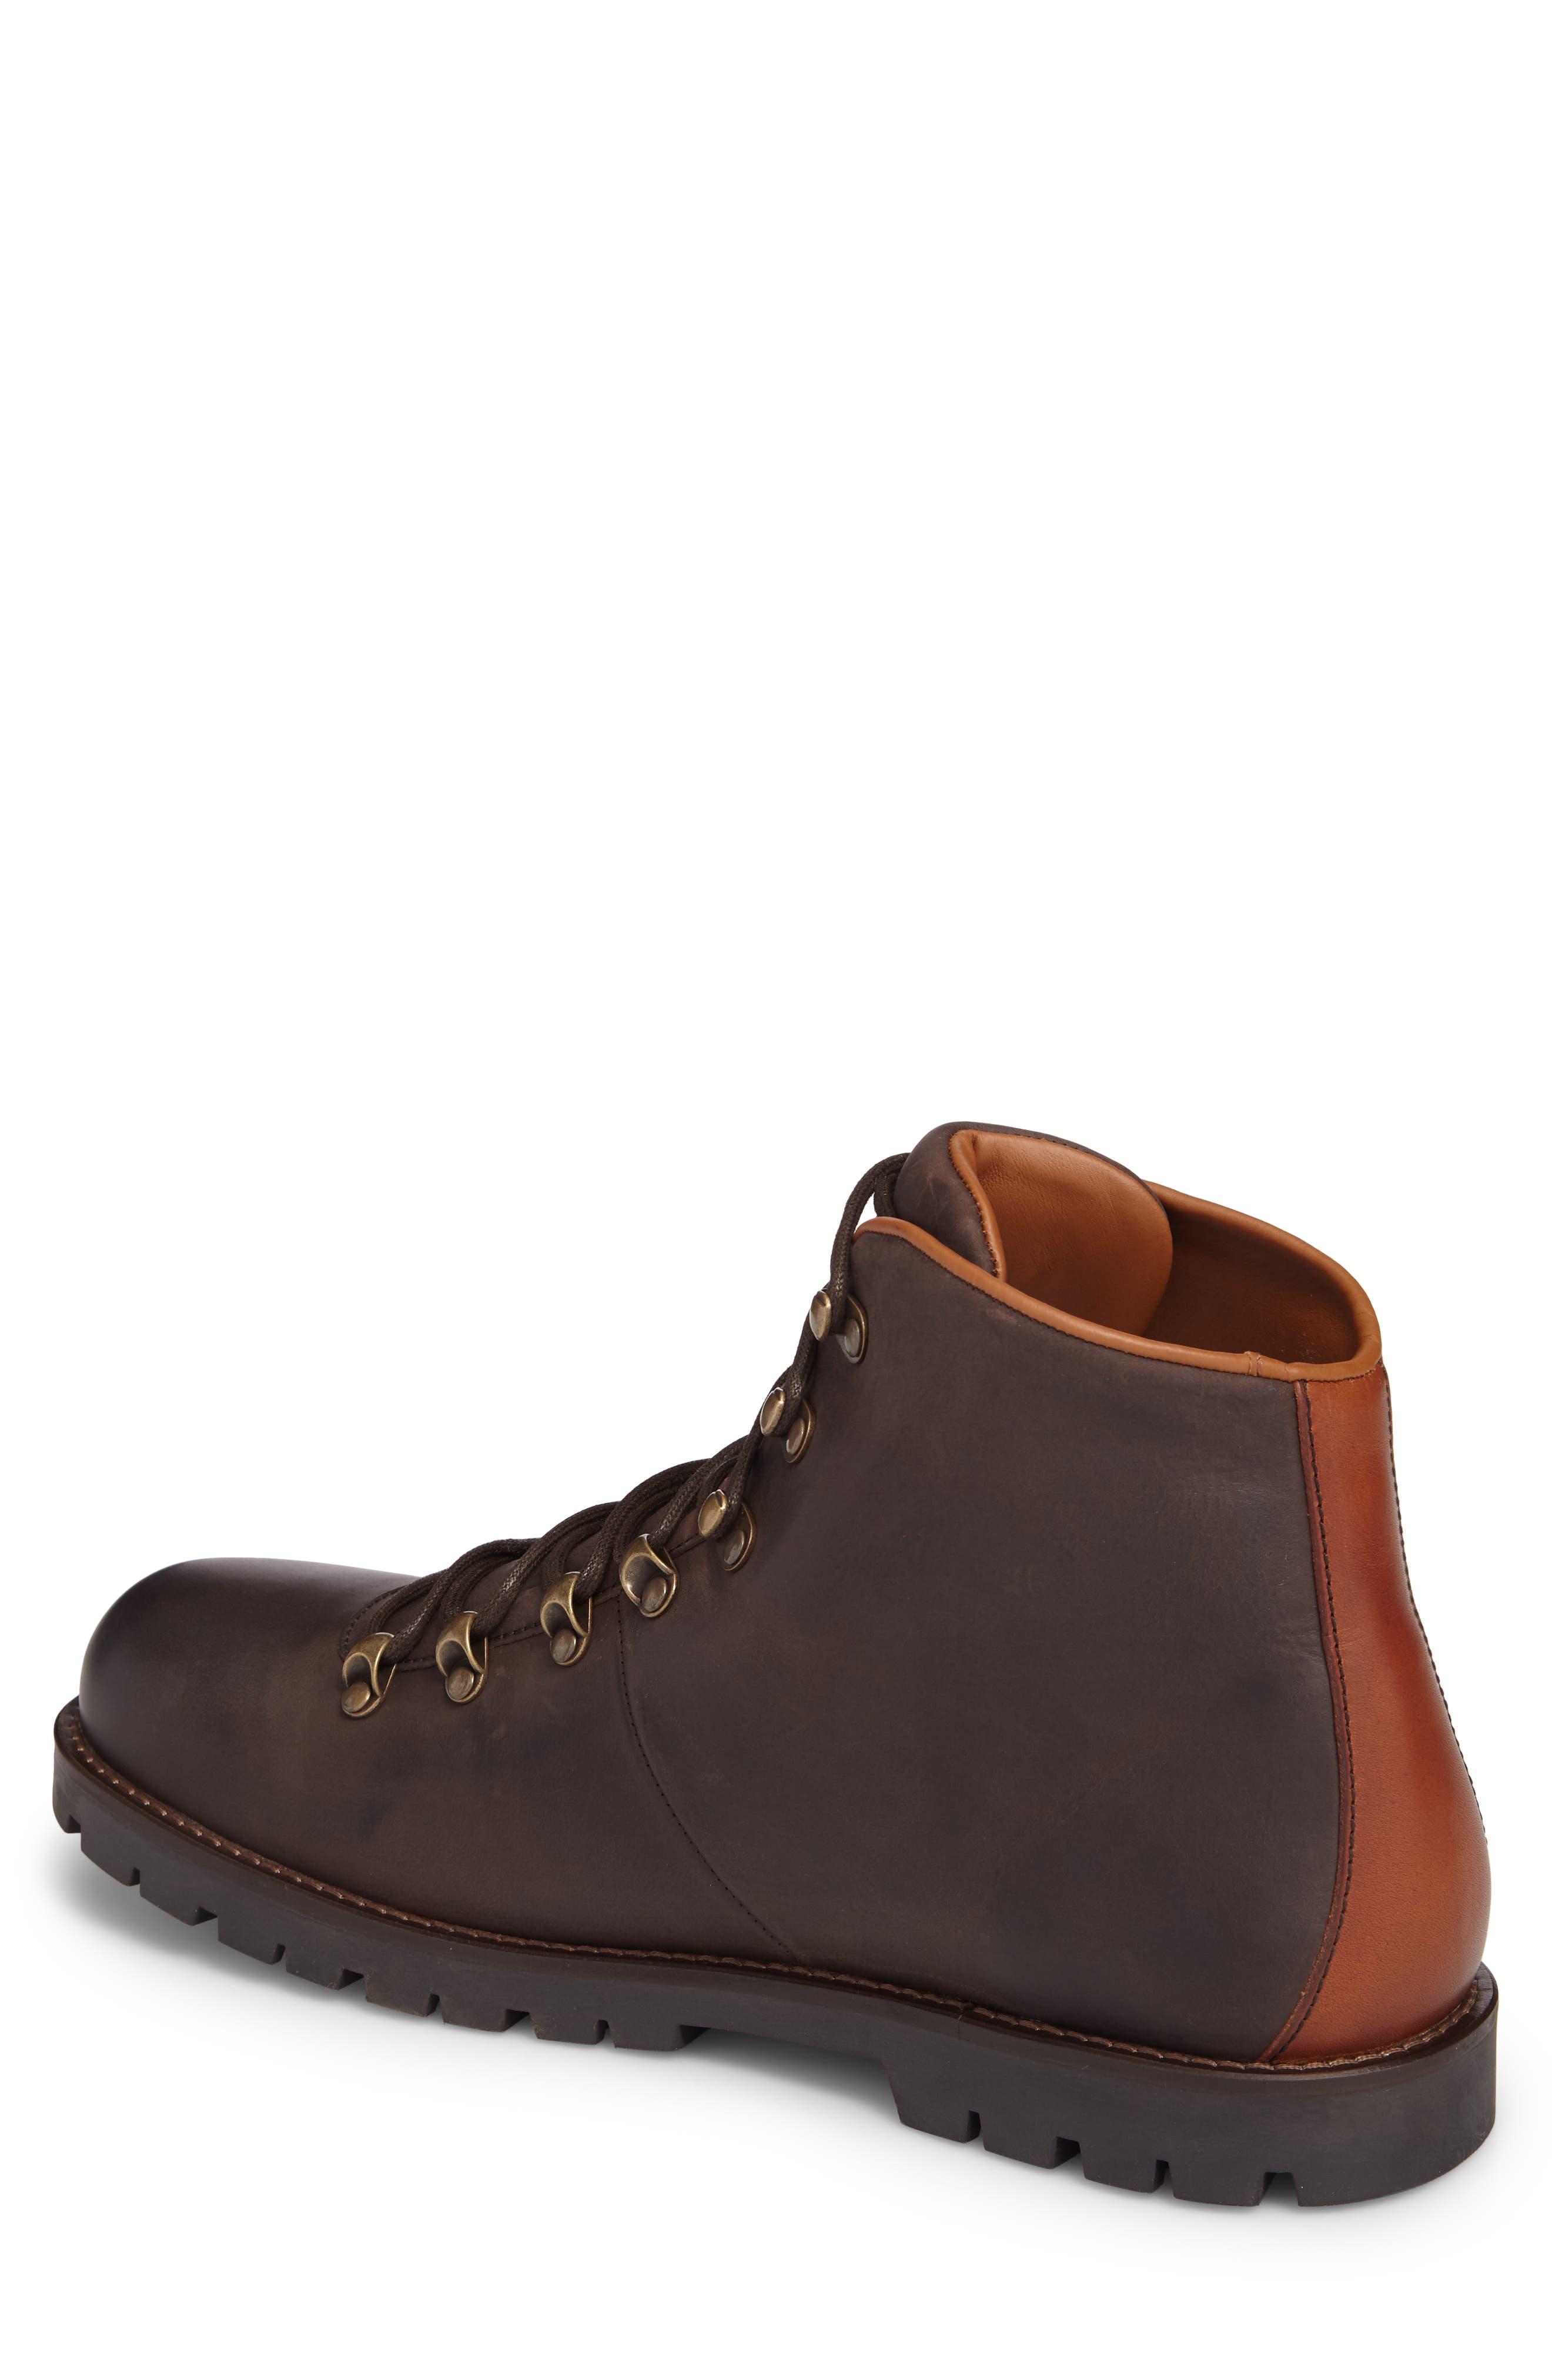 Hancock Plain Toe Boot,                             Alternate thumbnail 2, color,                             Dark Brown